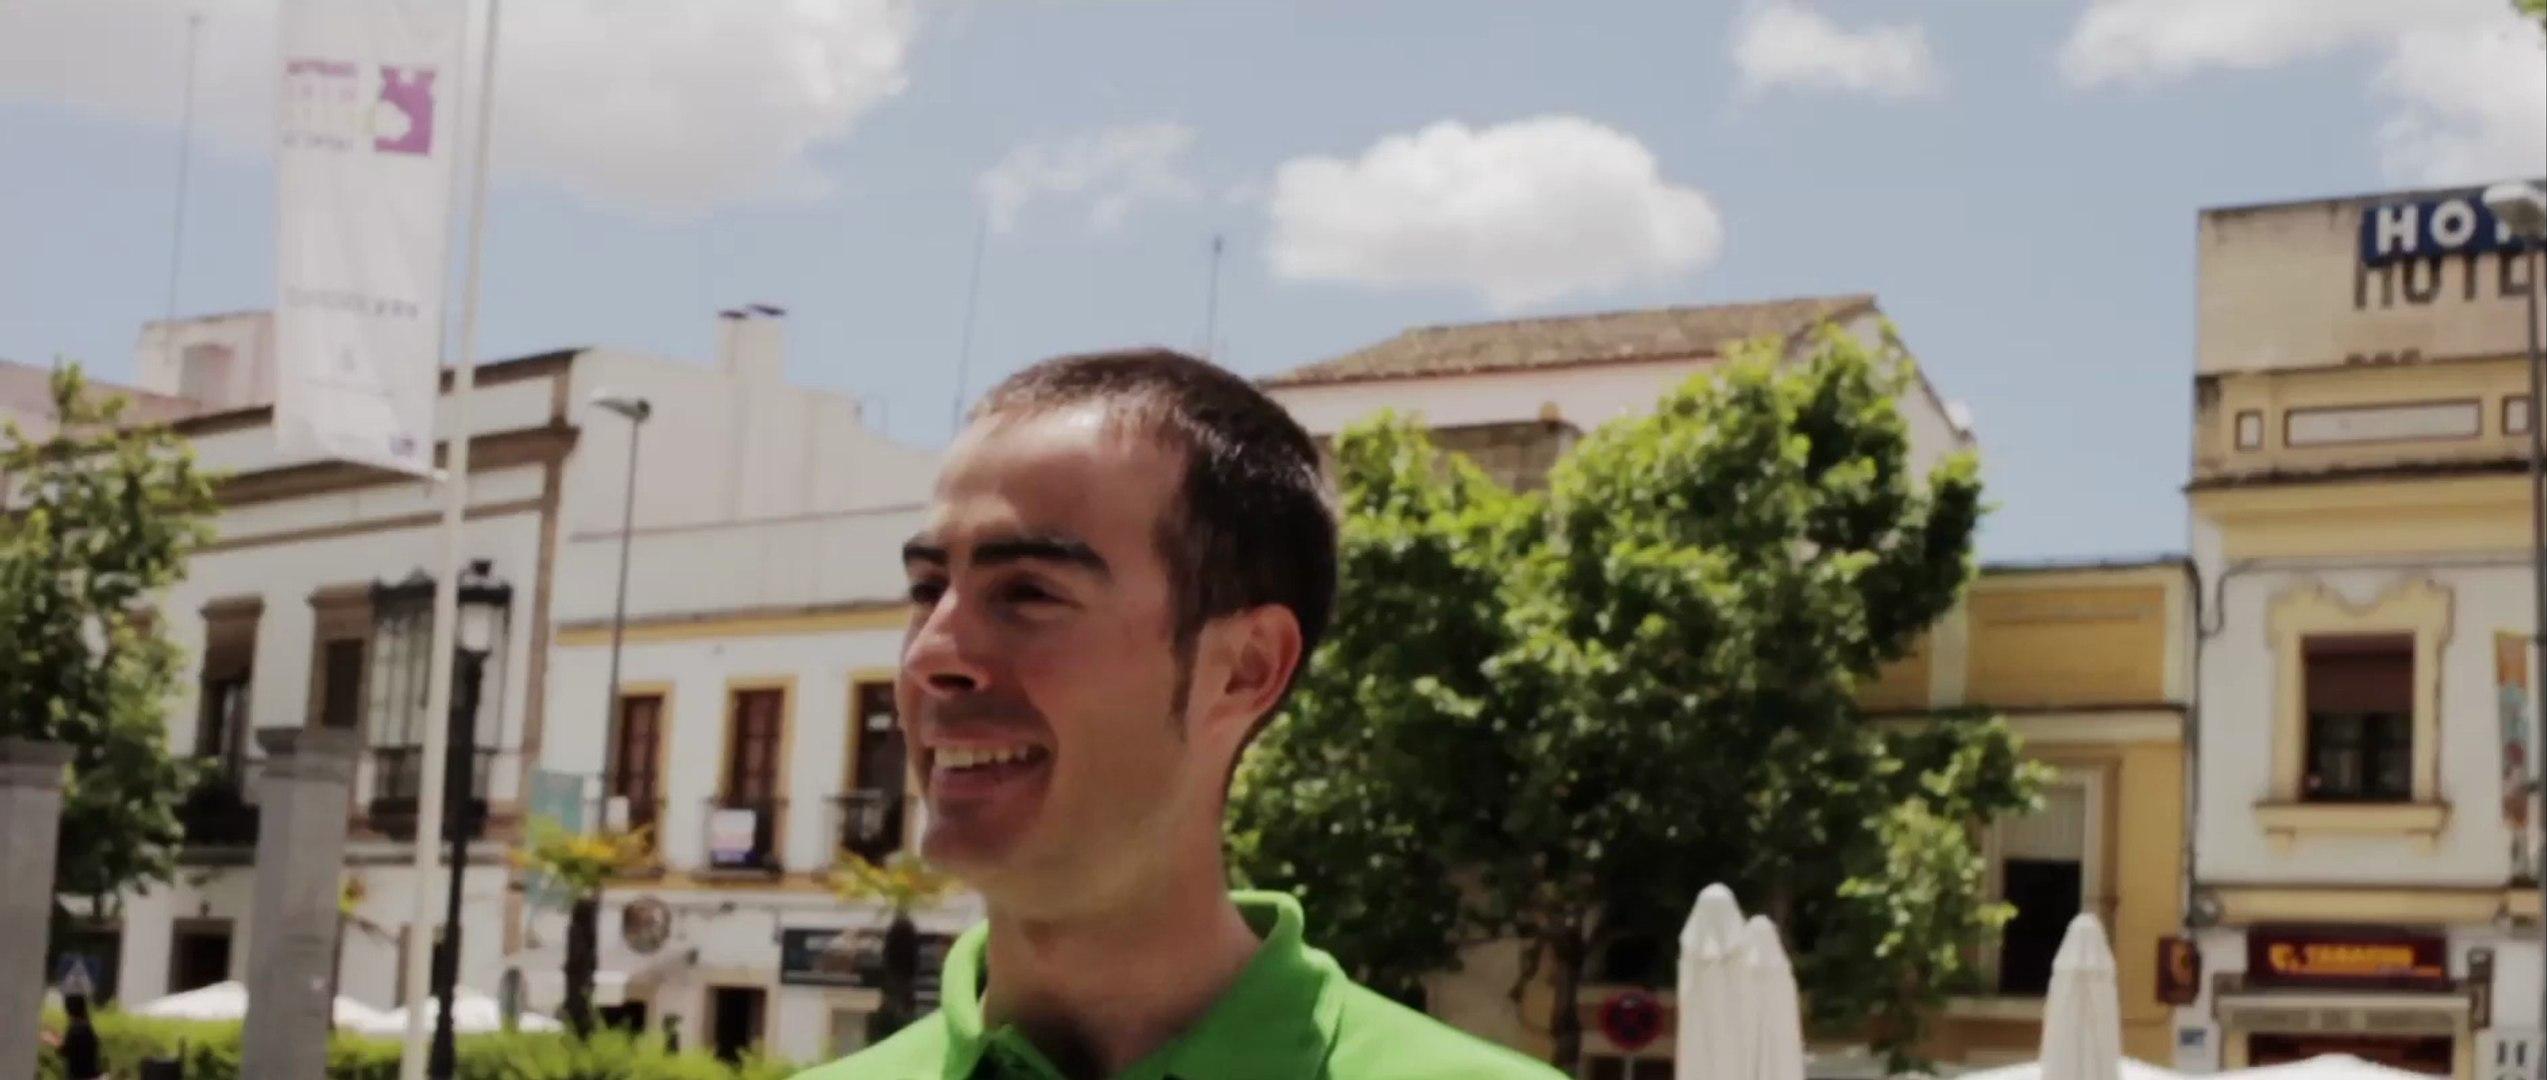 Antonio Piedra - CRE de Jerez de la Frontera La Vuelta 2014